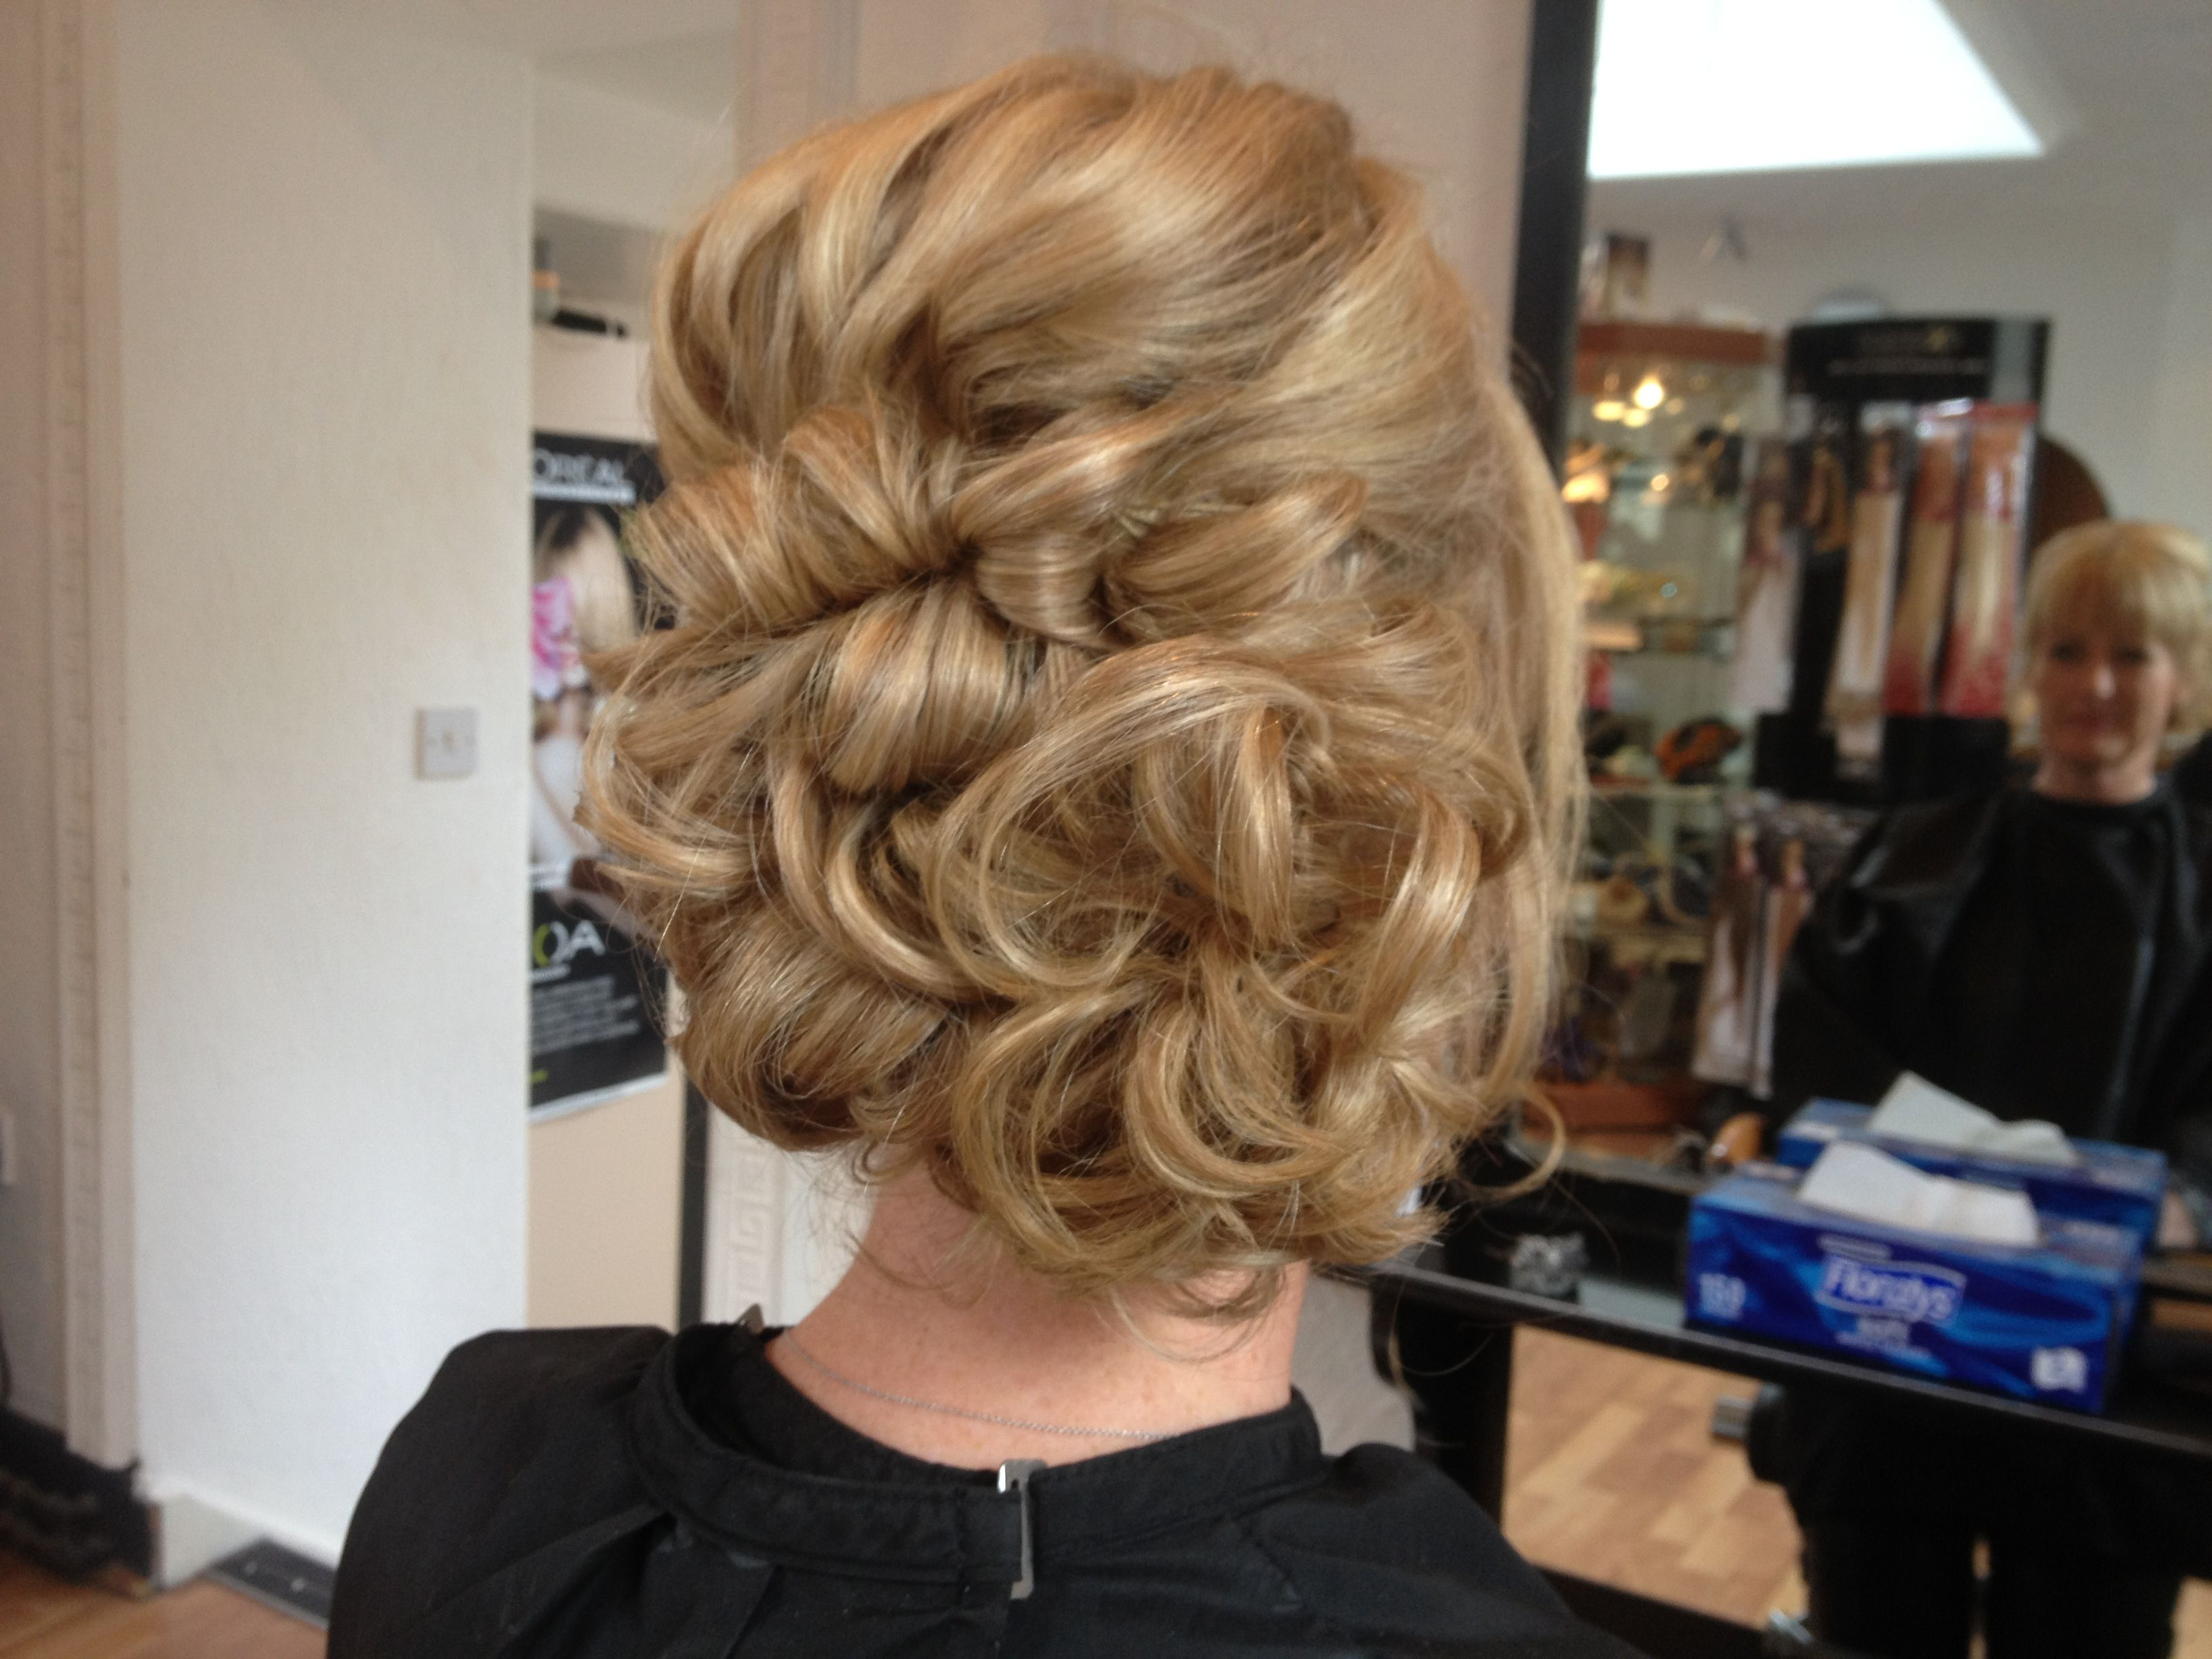 Pinned Up Curls On Mid Length Hair Hair Looks Pretty Hairstyles Hair